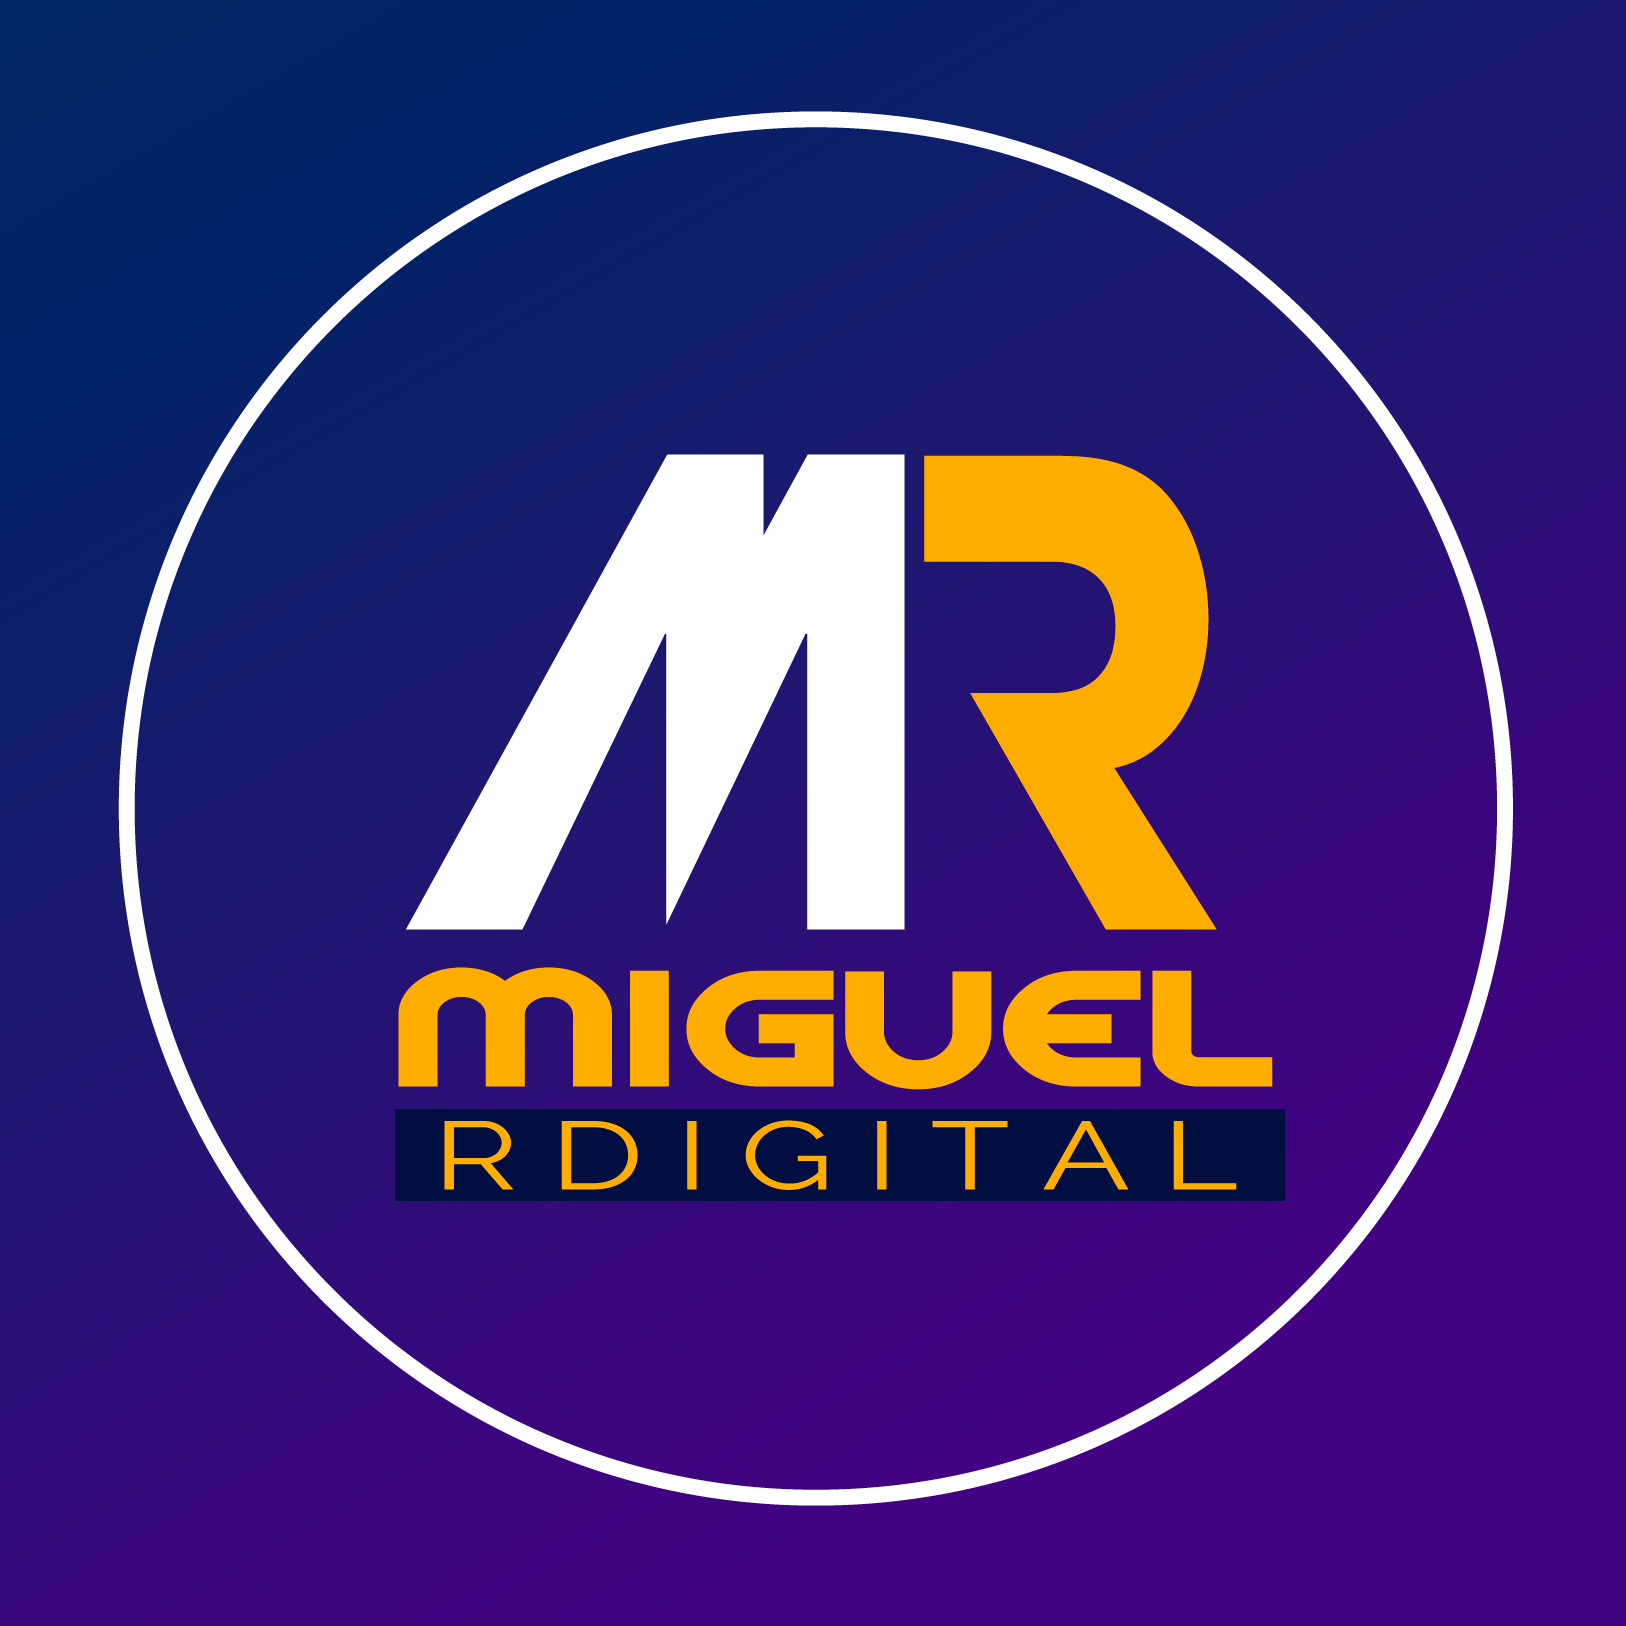 miguelrdigital